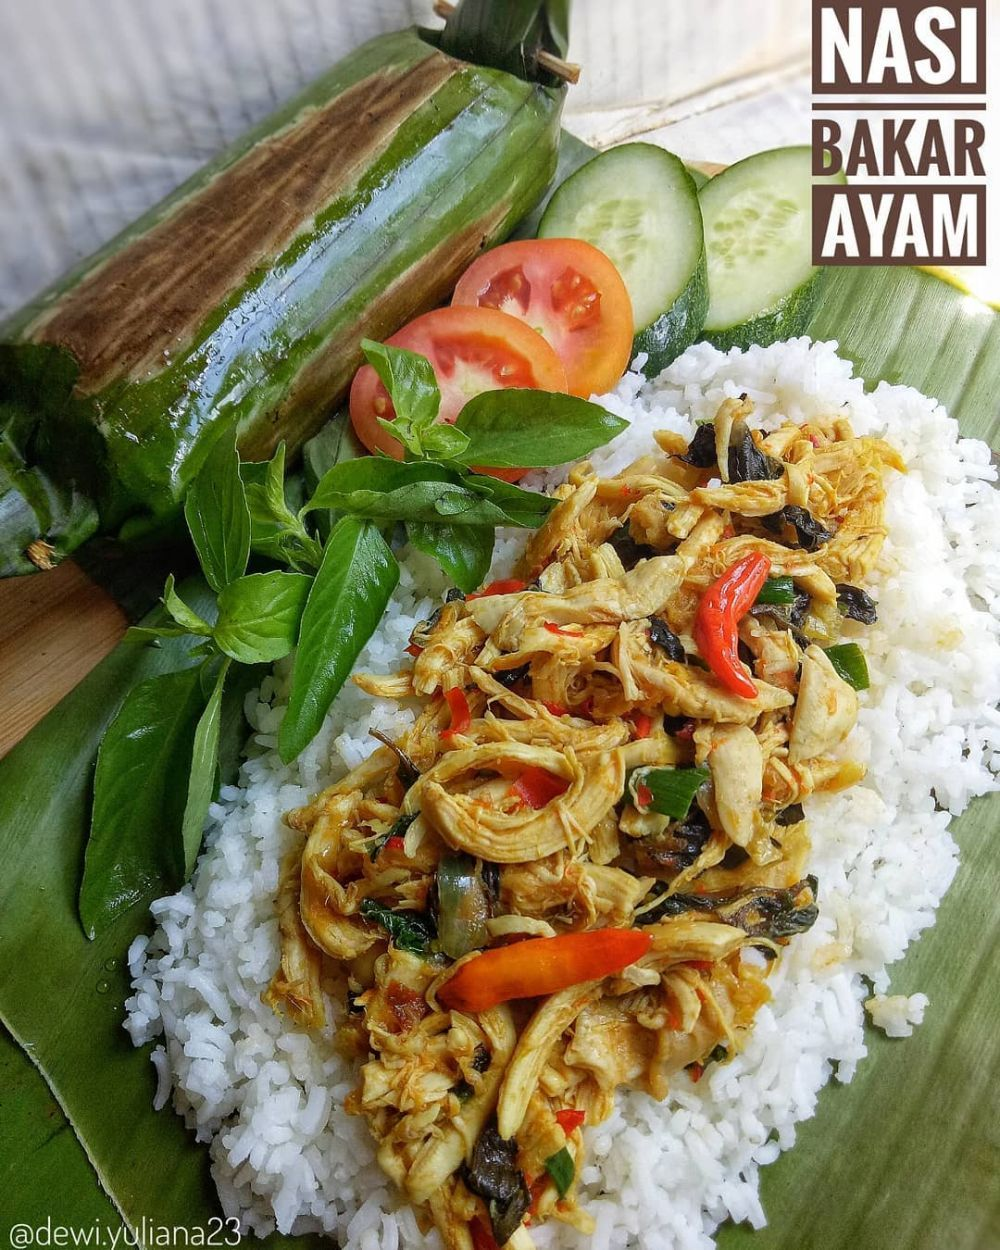 Resep Nasi Bakar Spesial C 2020 Instagram Dewi Yuliana23 Instagram Laila Umi Resep Masakan Masakan Resep Makanan Sehat